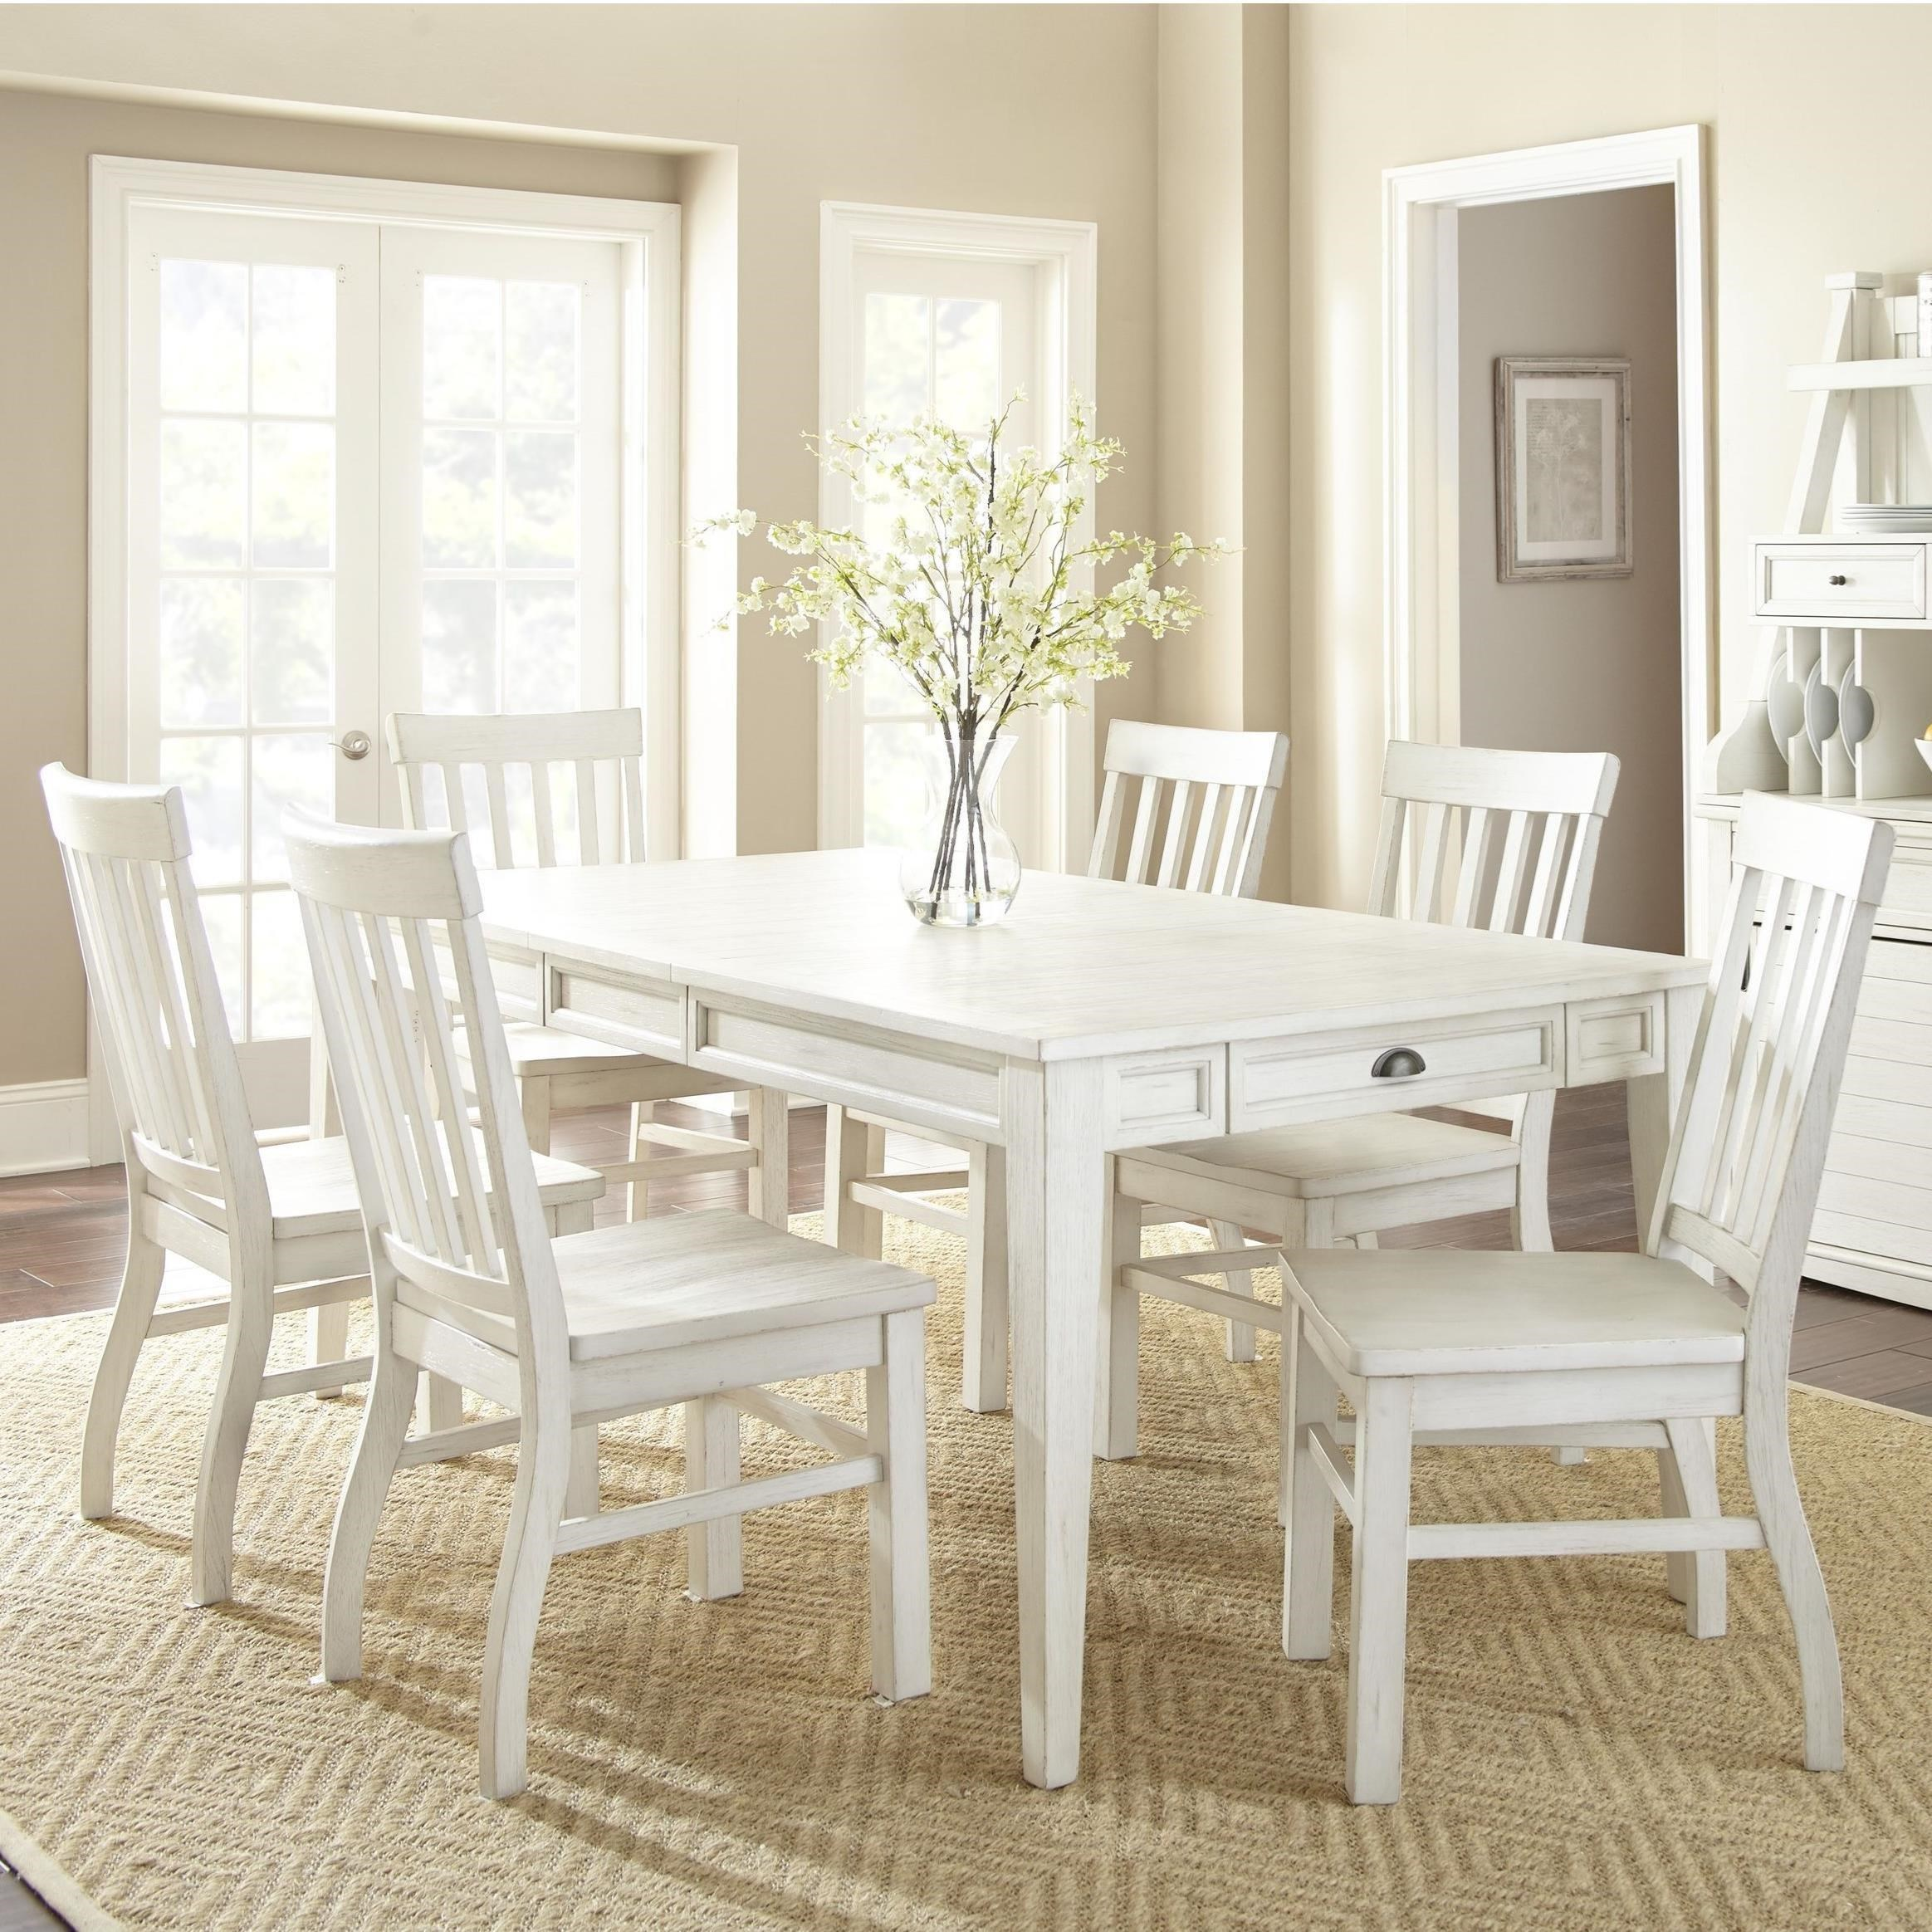 Steve Silver Cayla 5 Piece Farmhouse Dining Set With Table